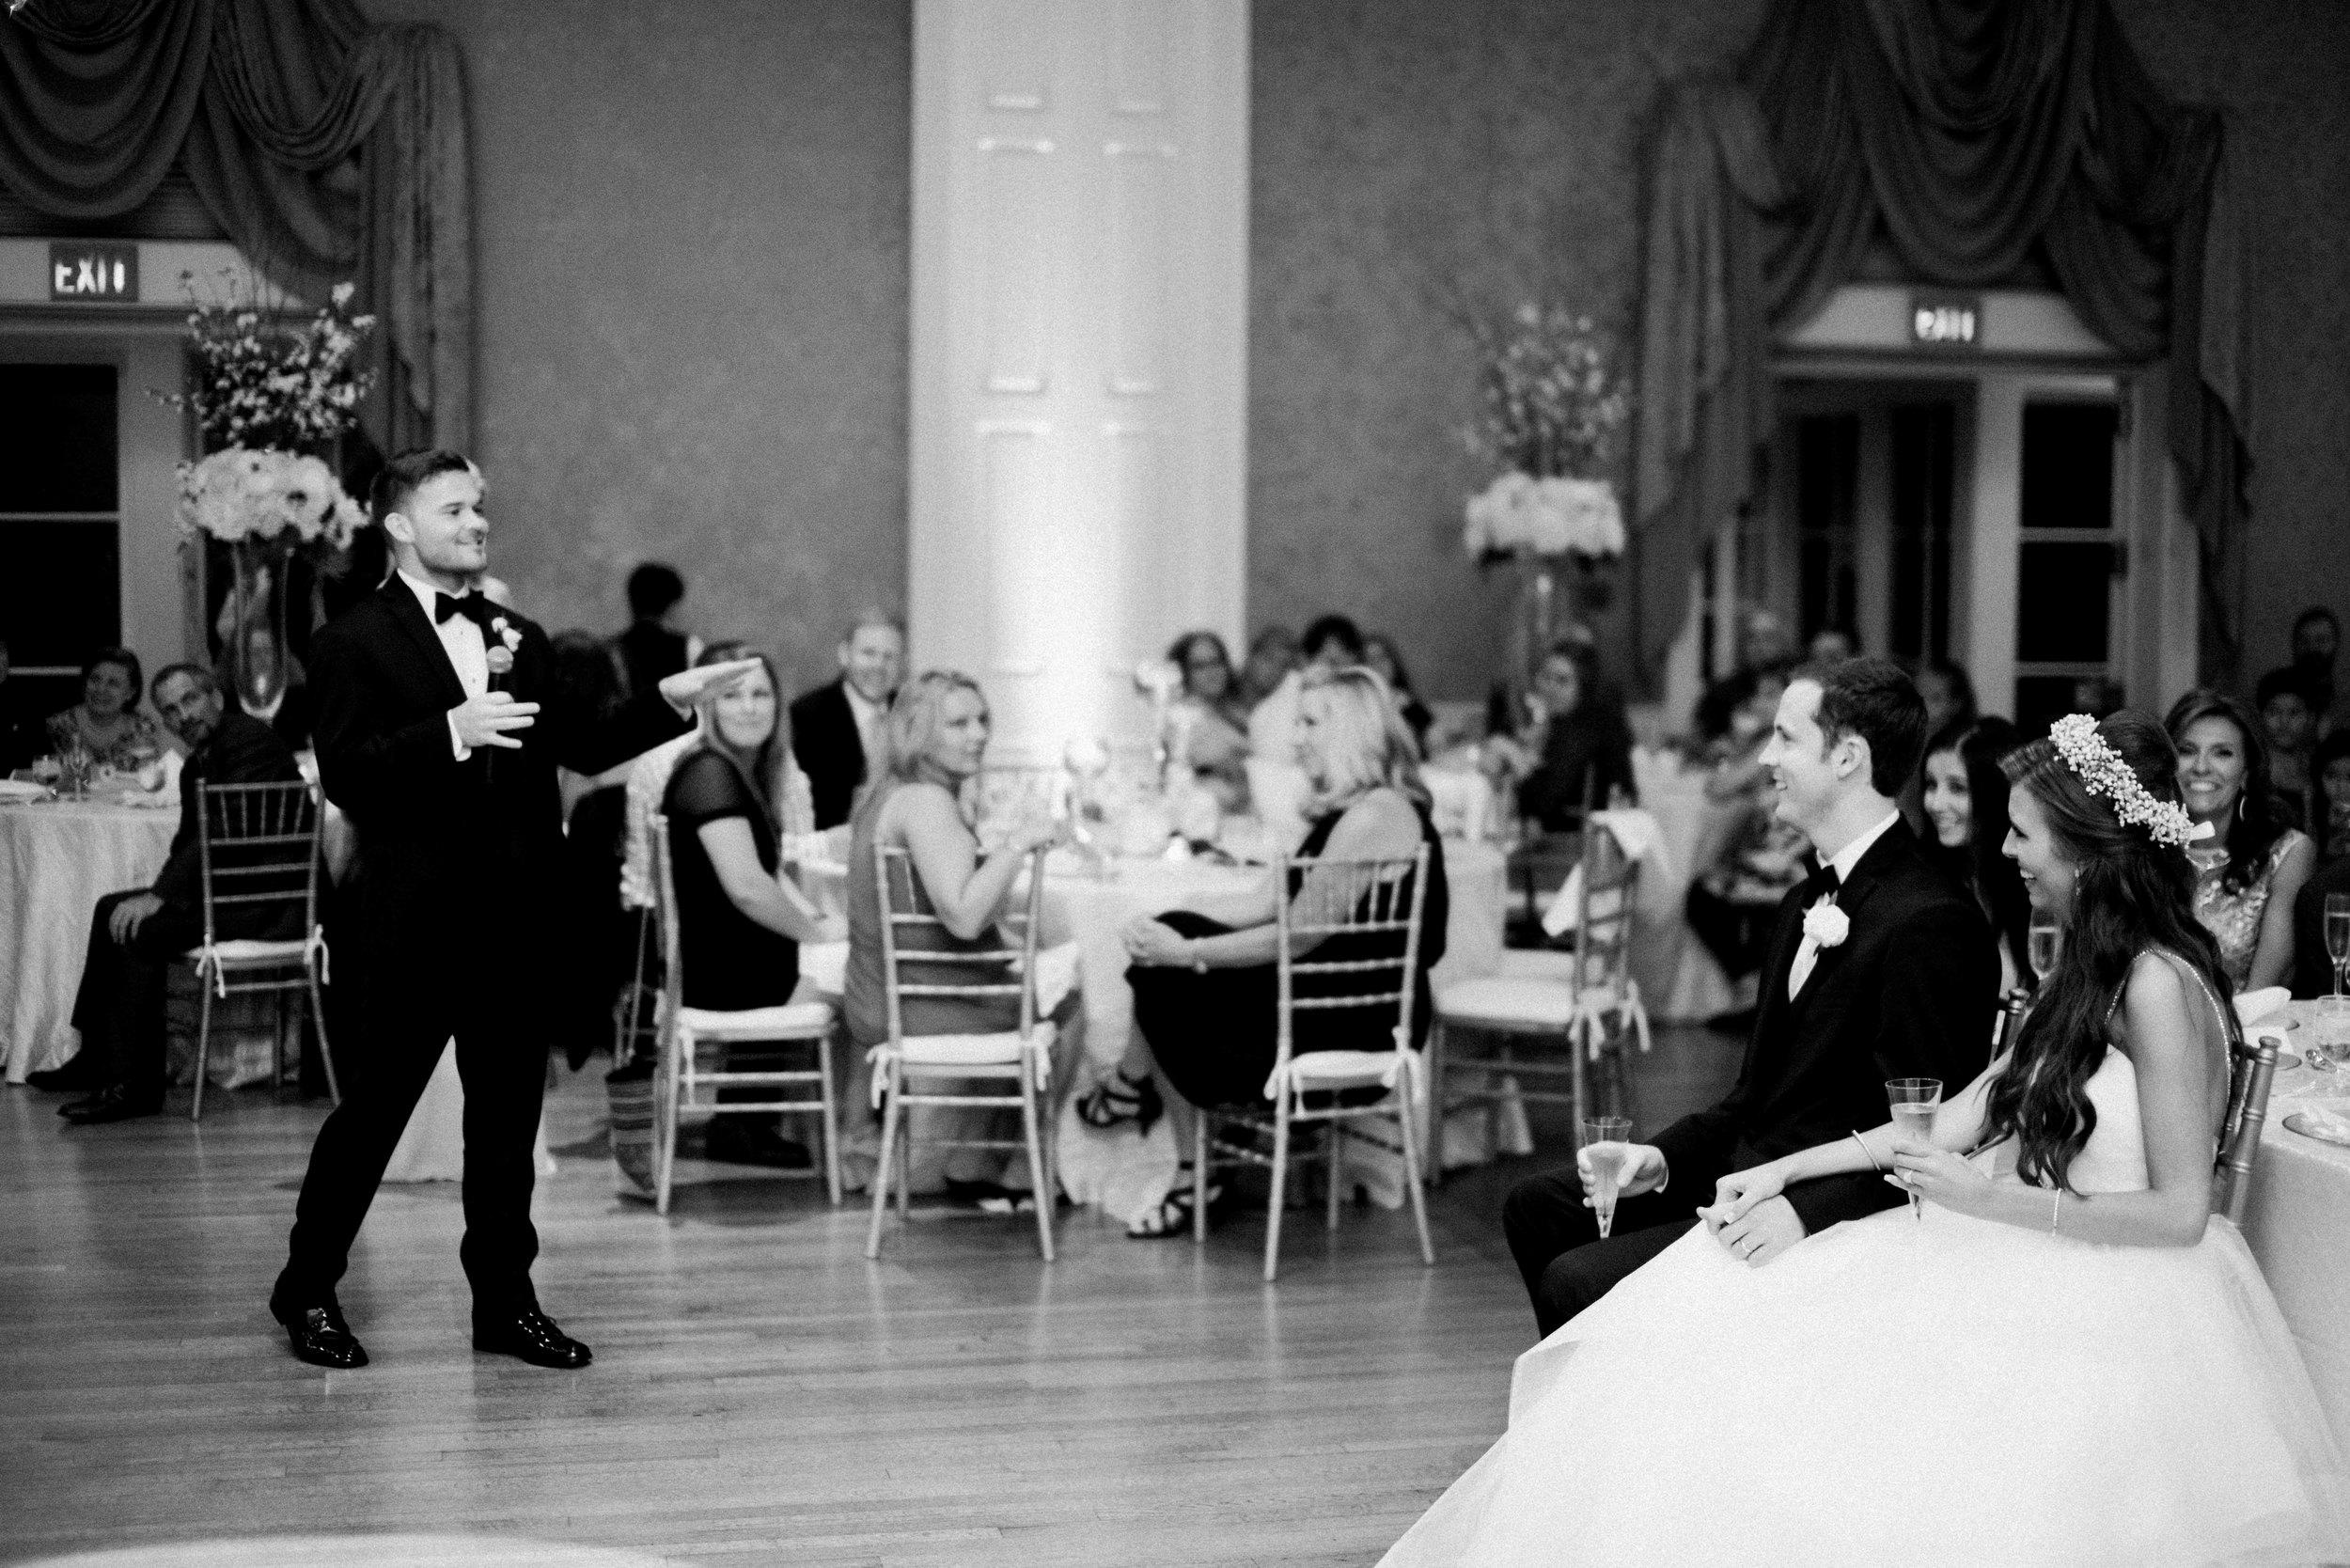 Dana-Fernandez-Photography-Weddings-in-Houston-Magazine-feature-Houston-wedding-photographer-film-42.jpg